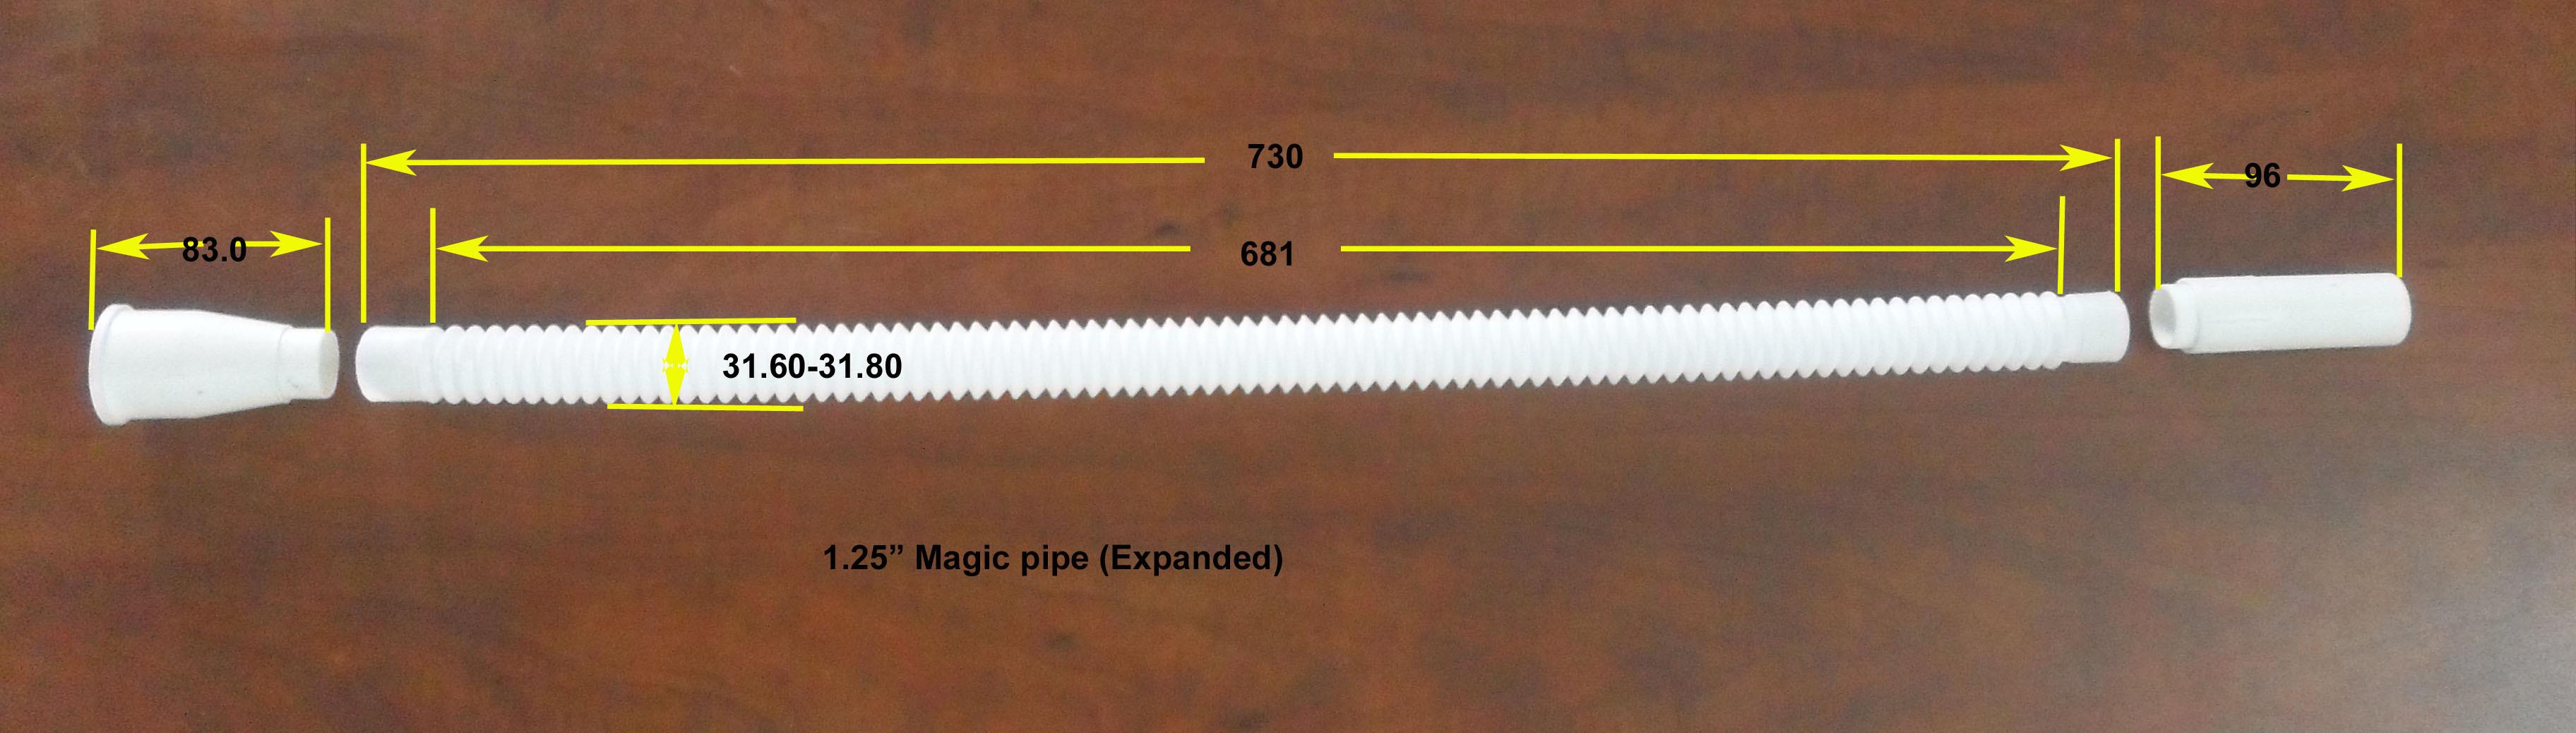 magic corrugated pipe